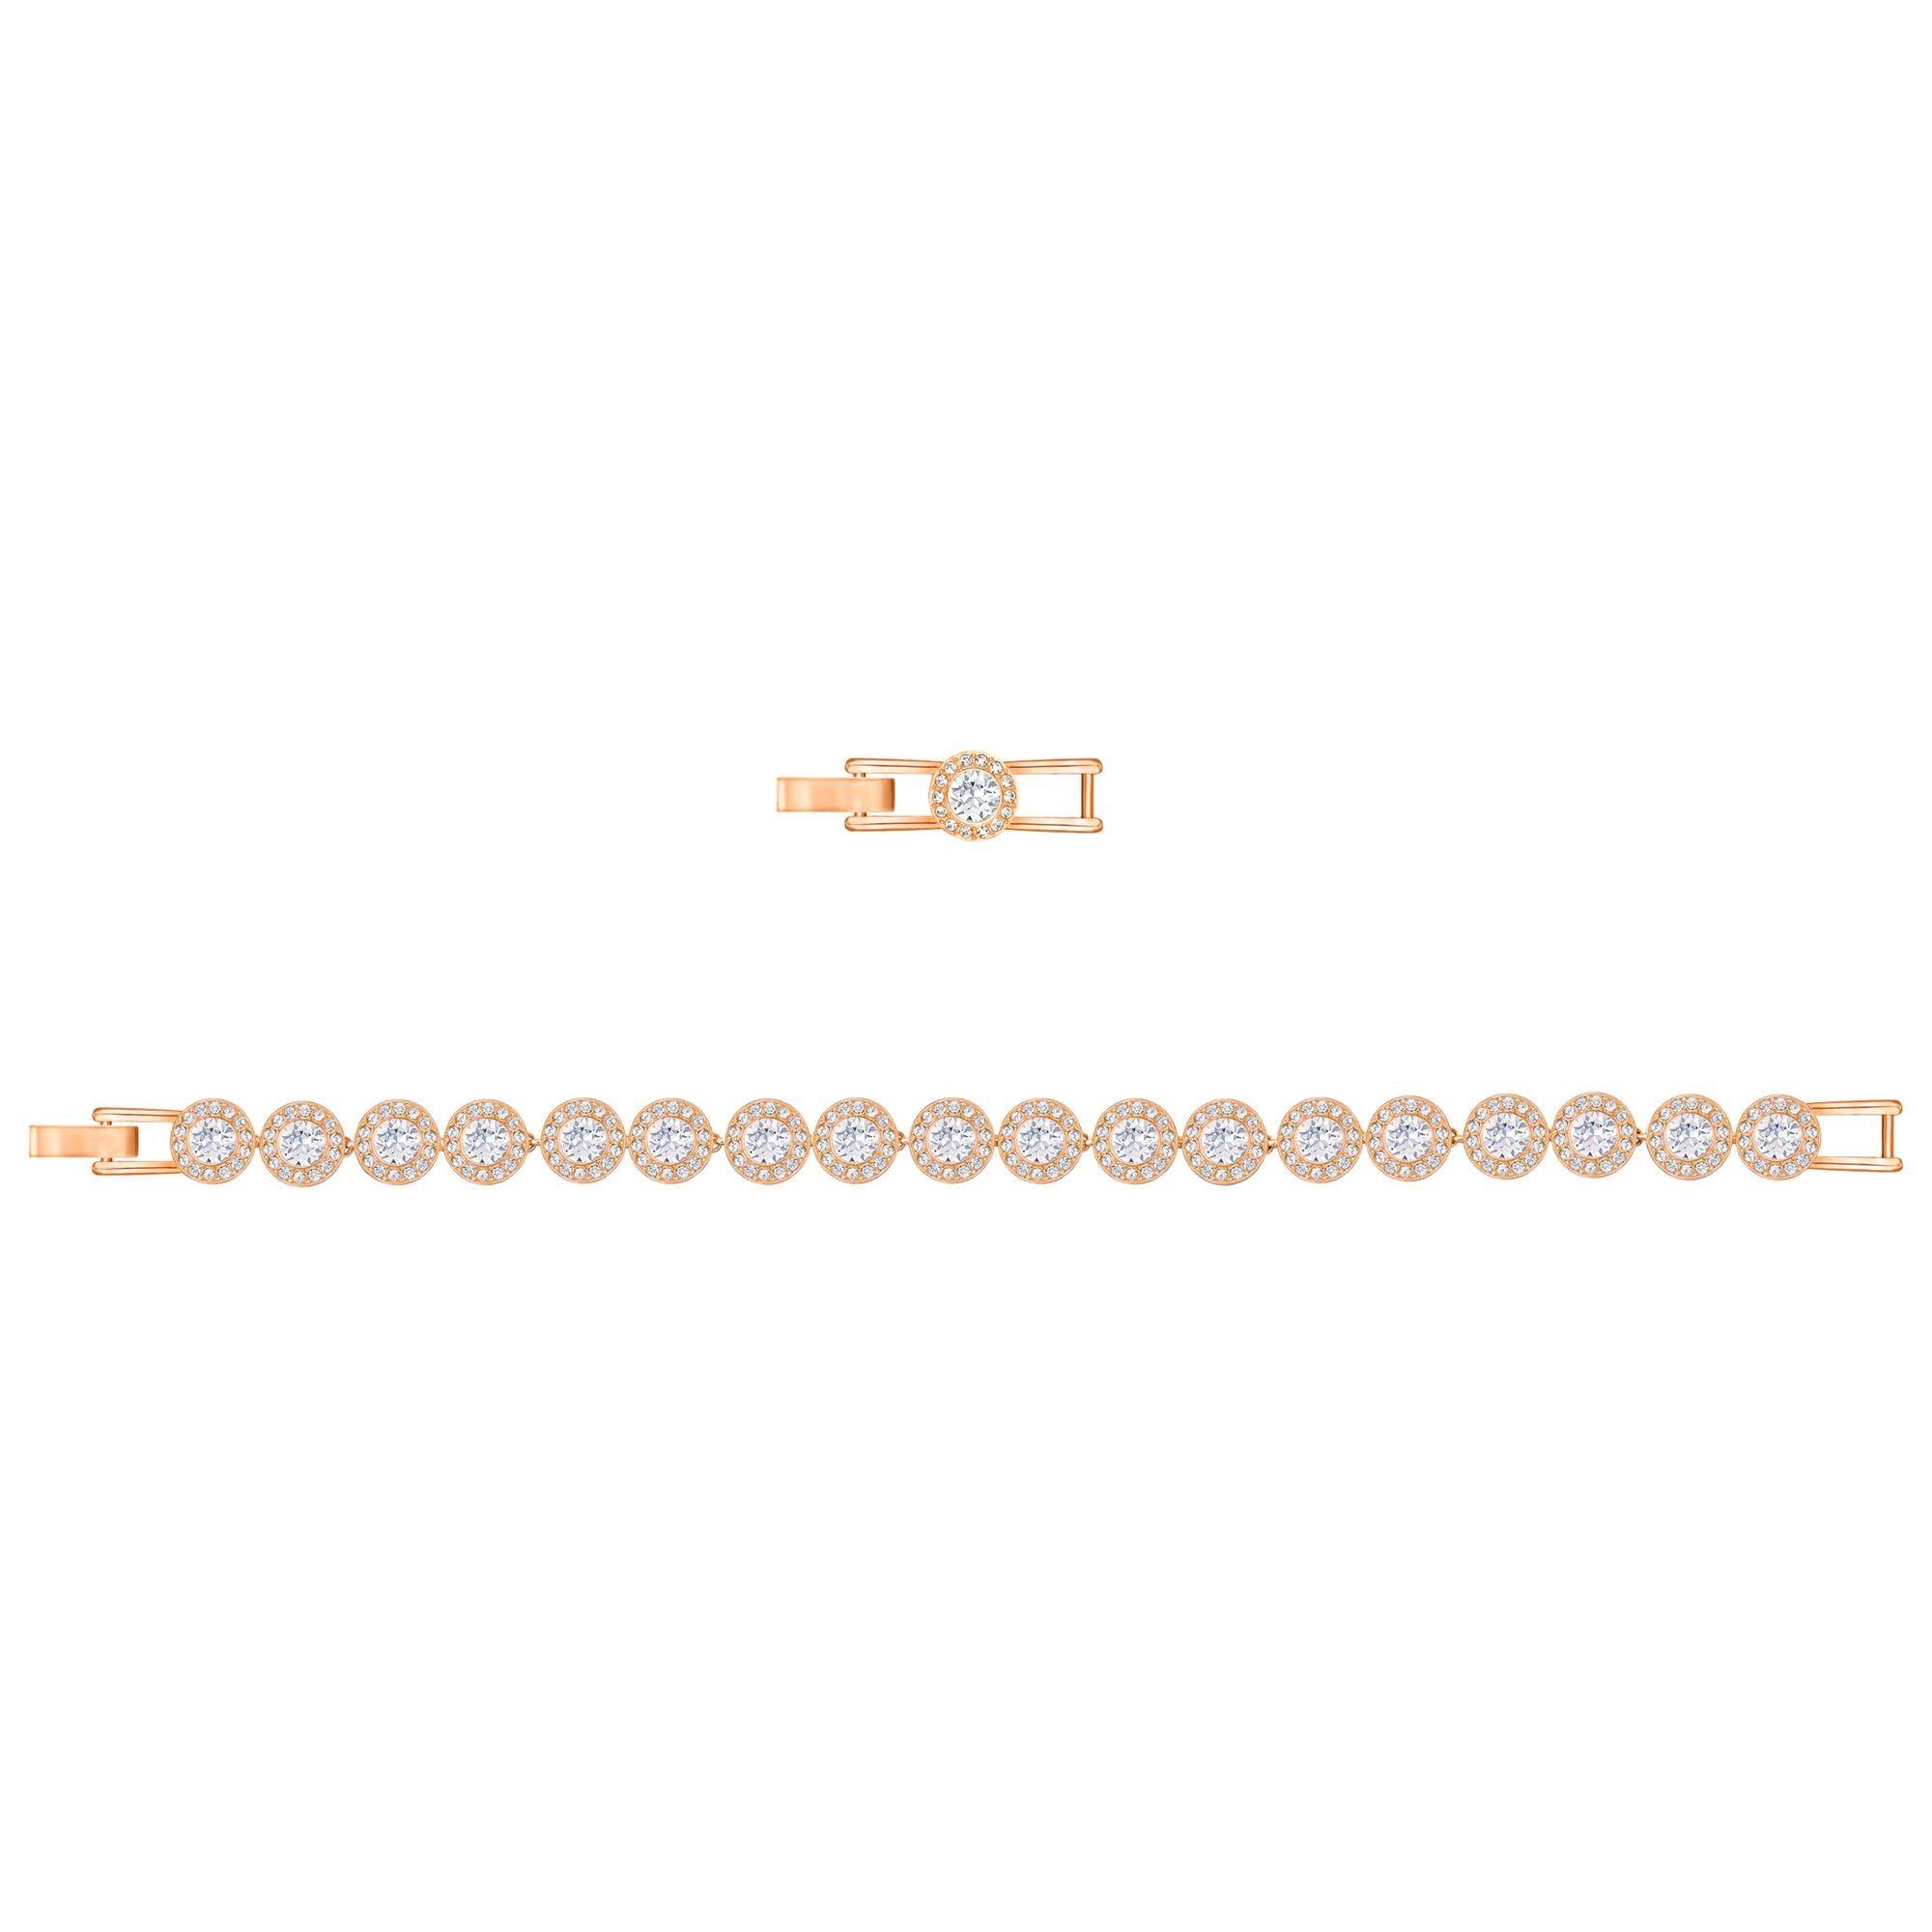 14e7758344c01dcf608228db30f2b3a9